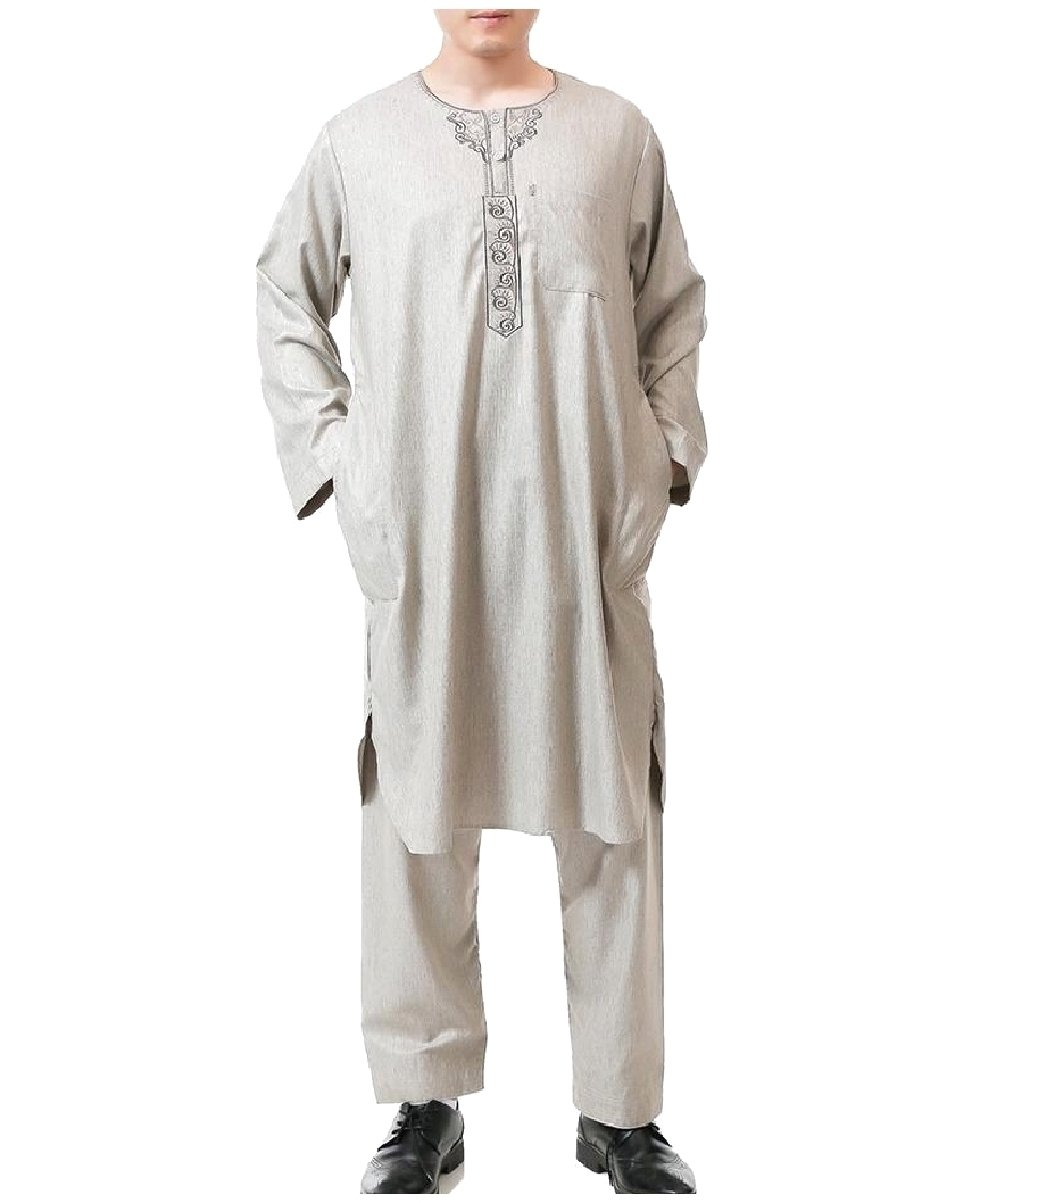 Coolred Men Islamic Embroidery Summer Back Cotton Muslim Salwar Suit Sets Khaki 54